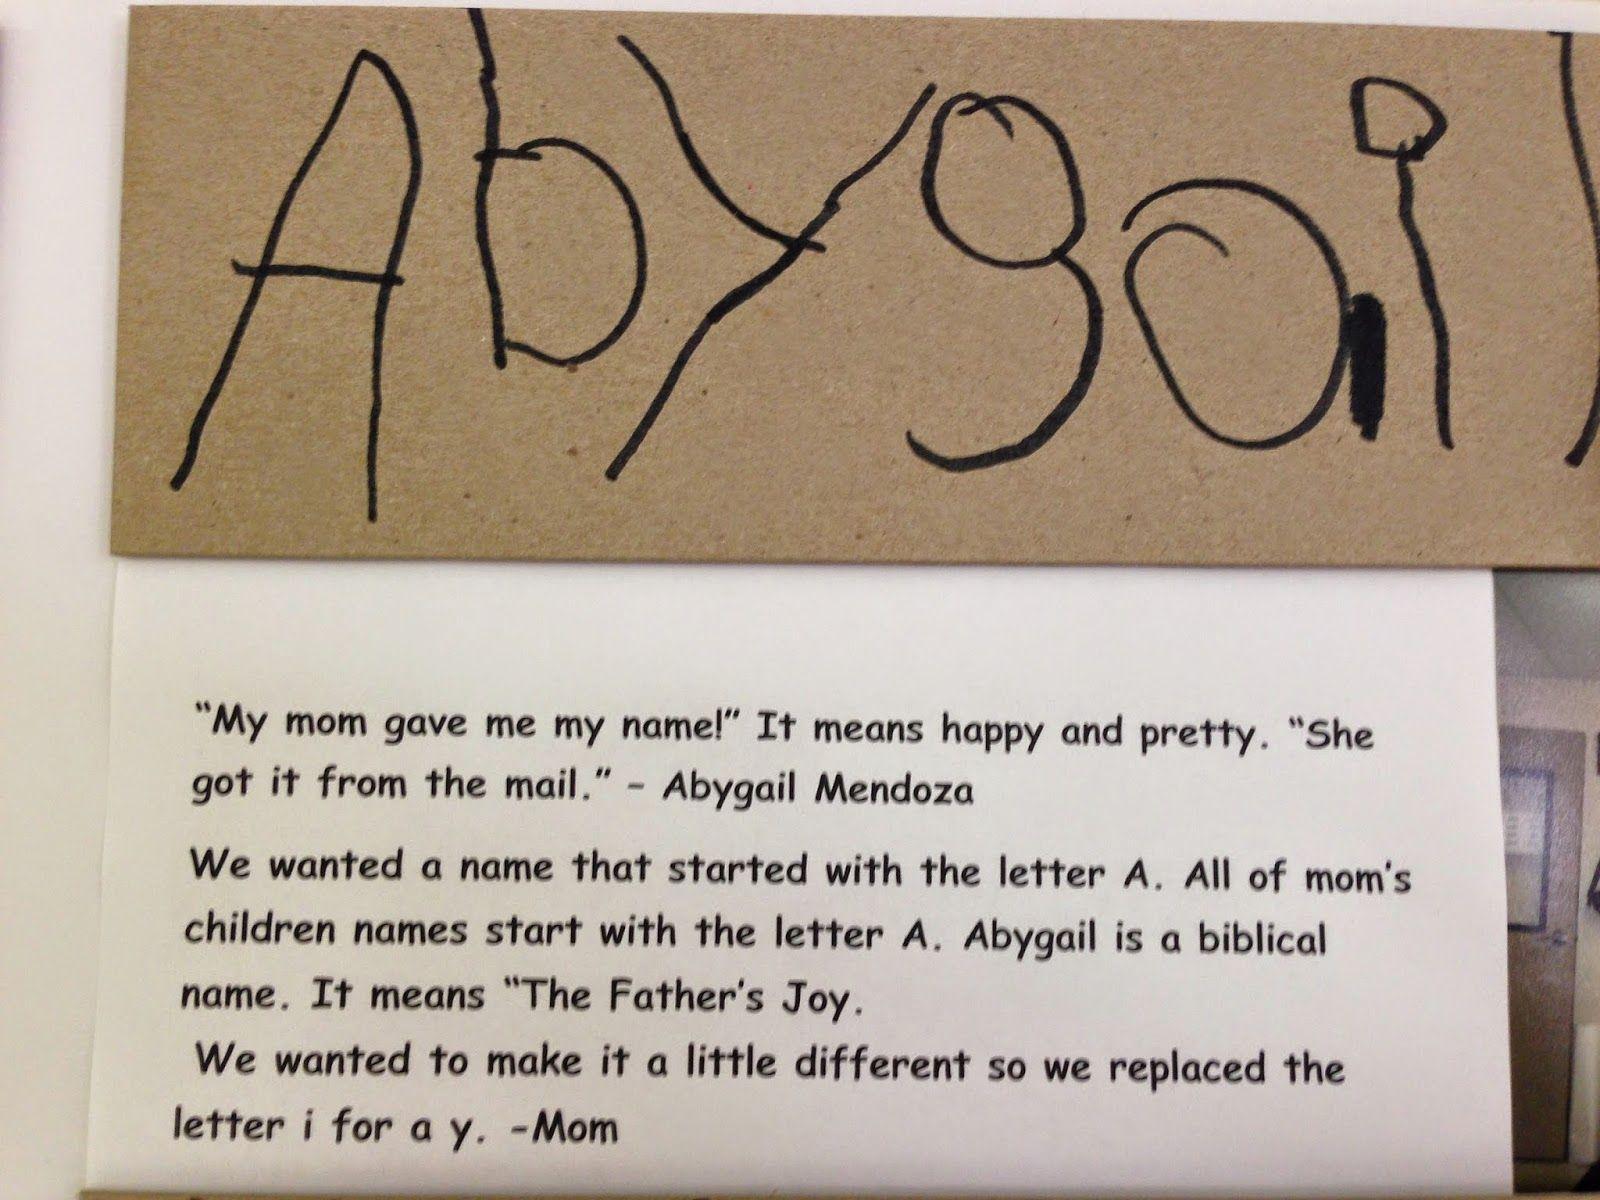 A Child's Name as a Bridge to Language and Self-Esteem